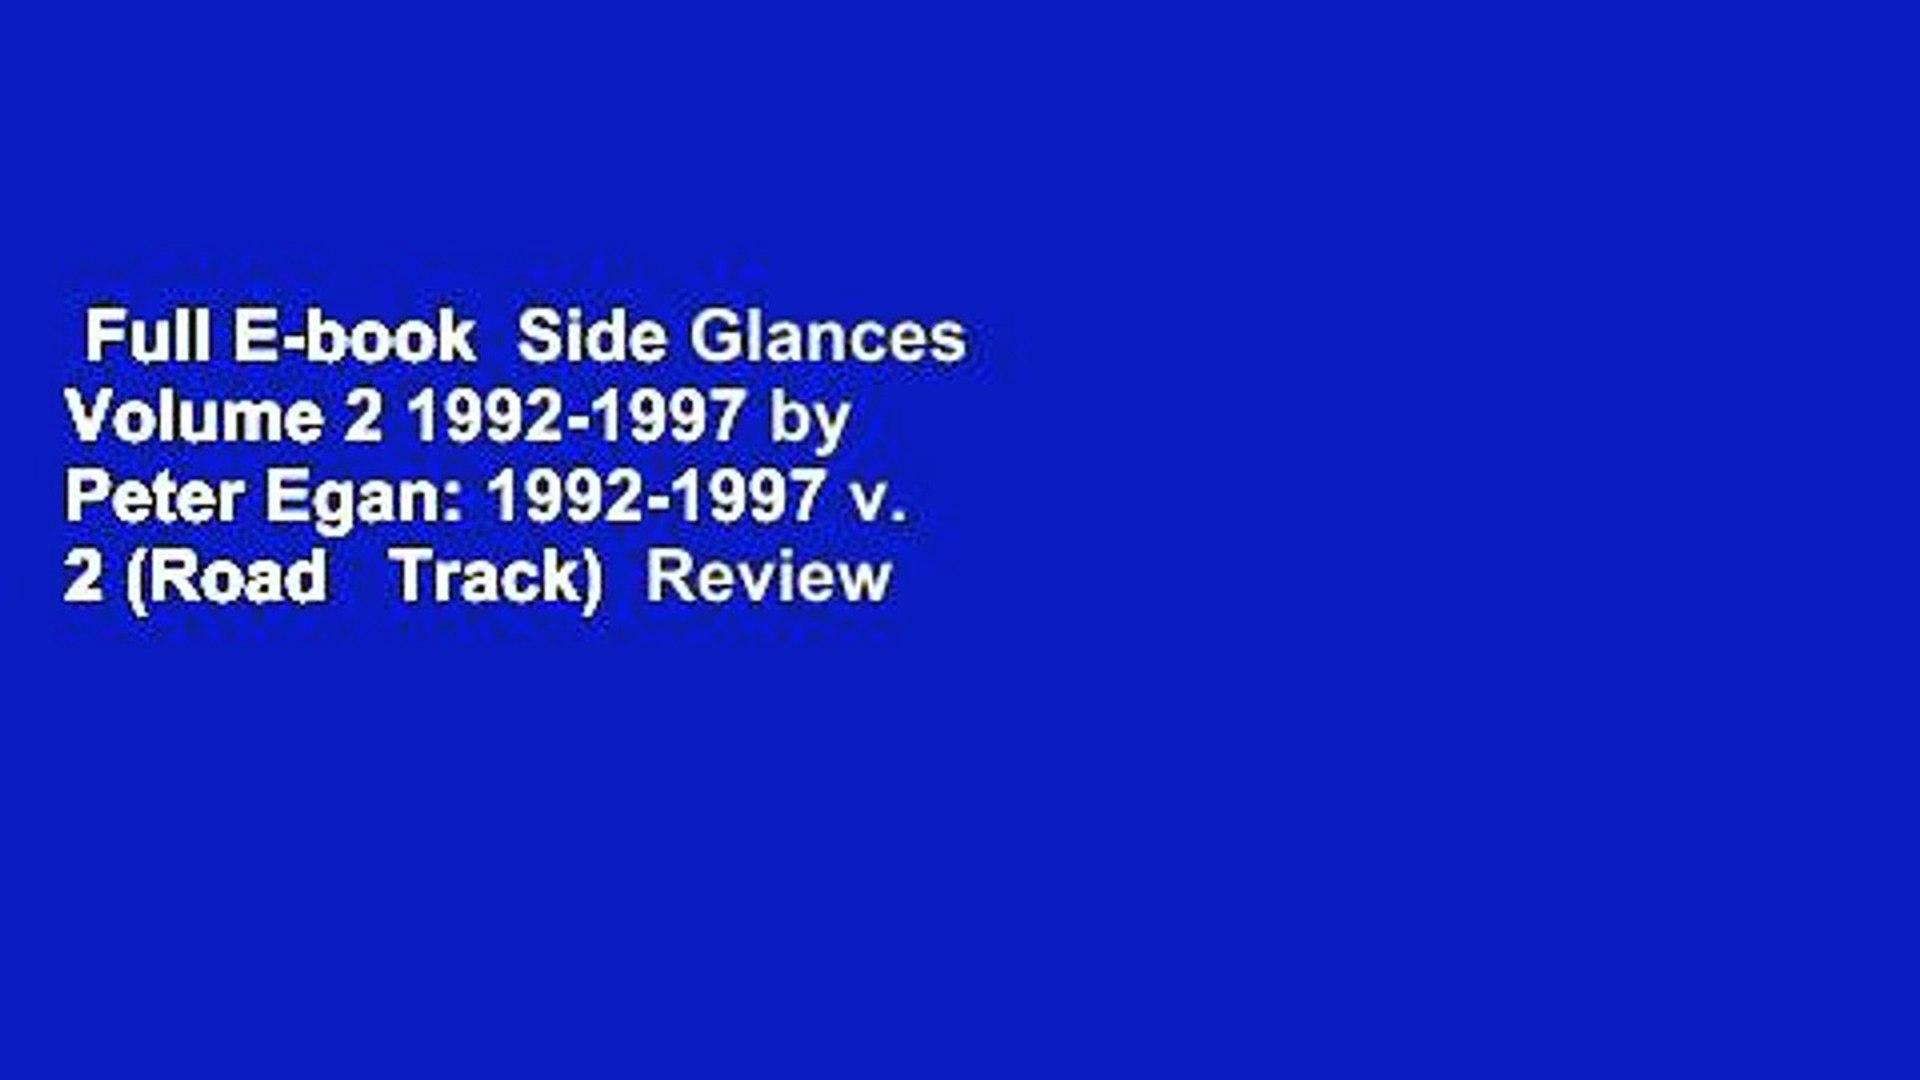 Full E-book  Side Glances Volume 2 1992-1997 by Peter Egan: 1992-1997 v. 2 (Road   Track)  Review